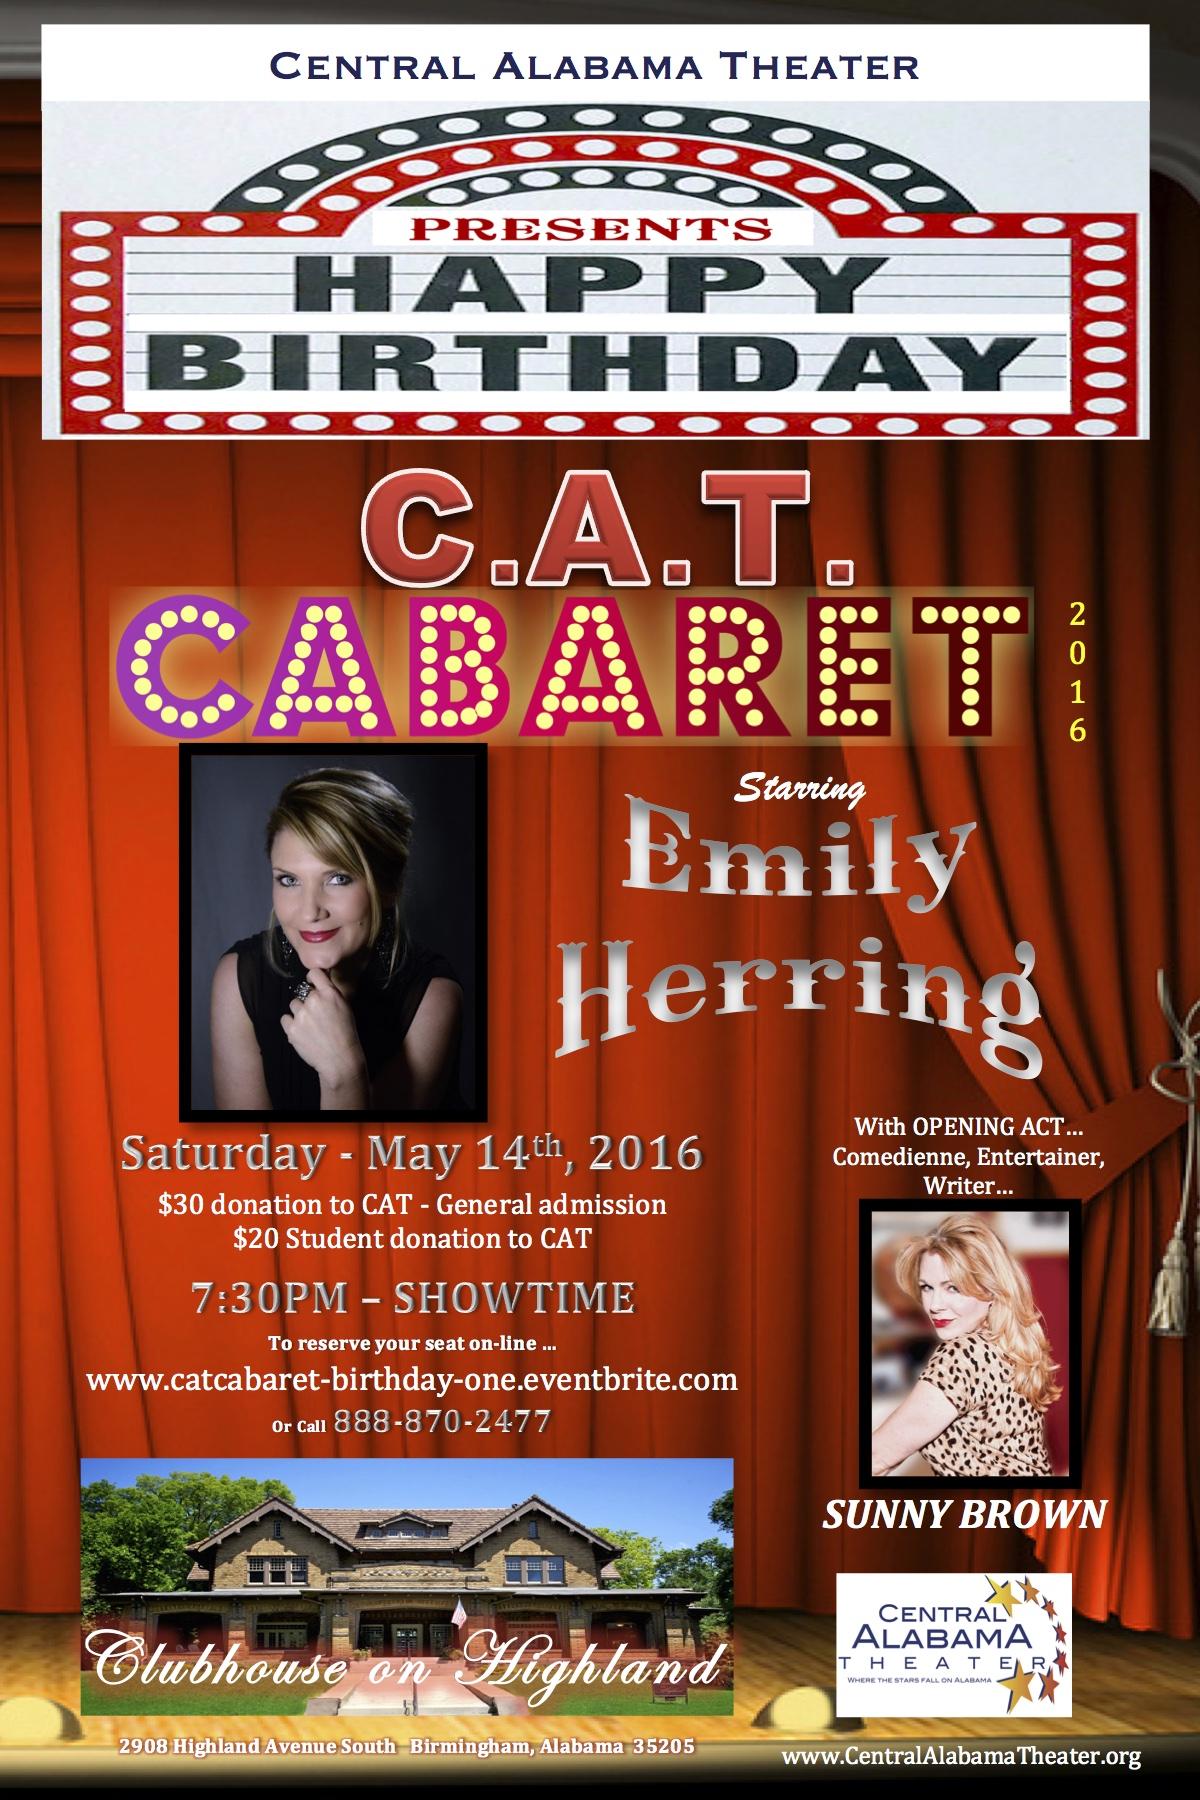 CAT CABARET -POSTCARD 4X6 One Year